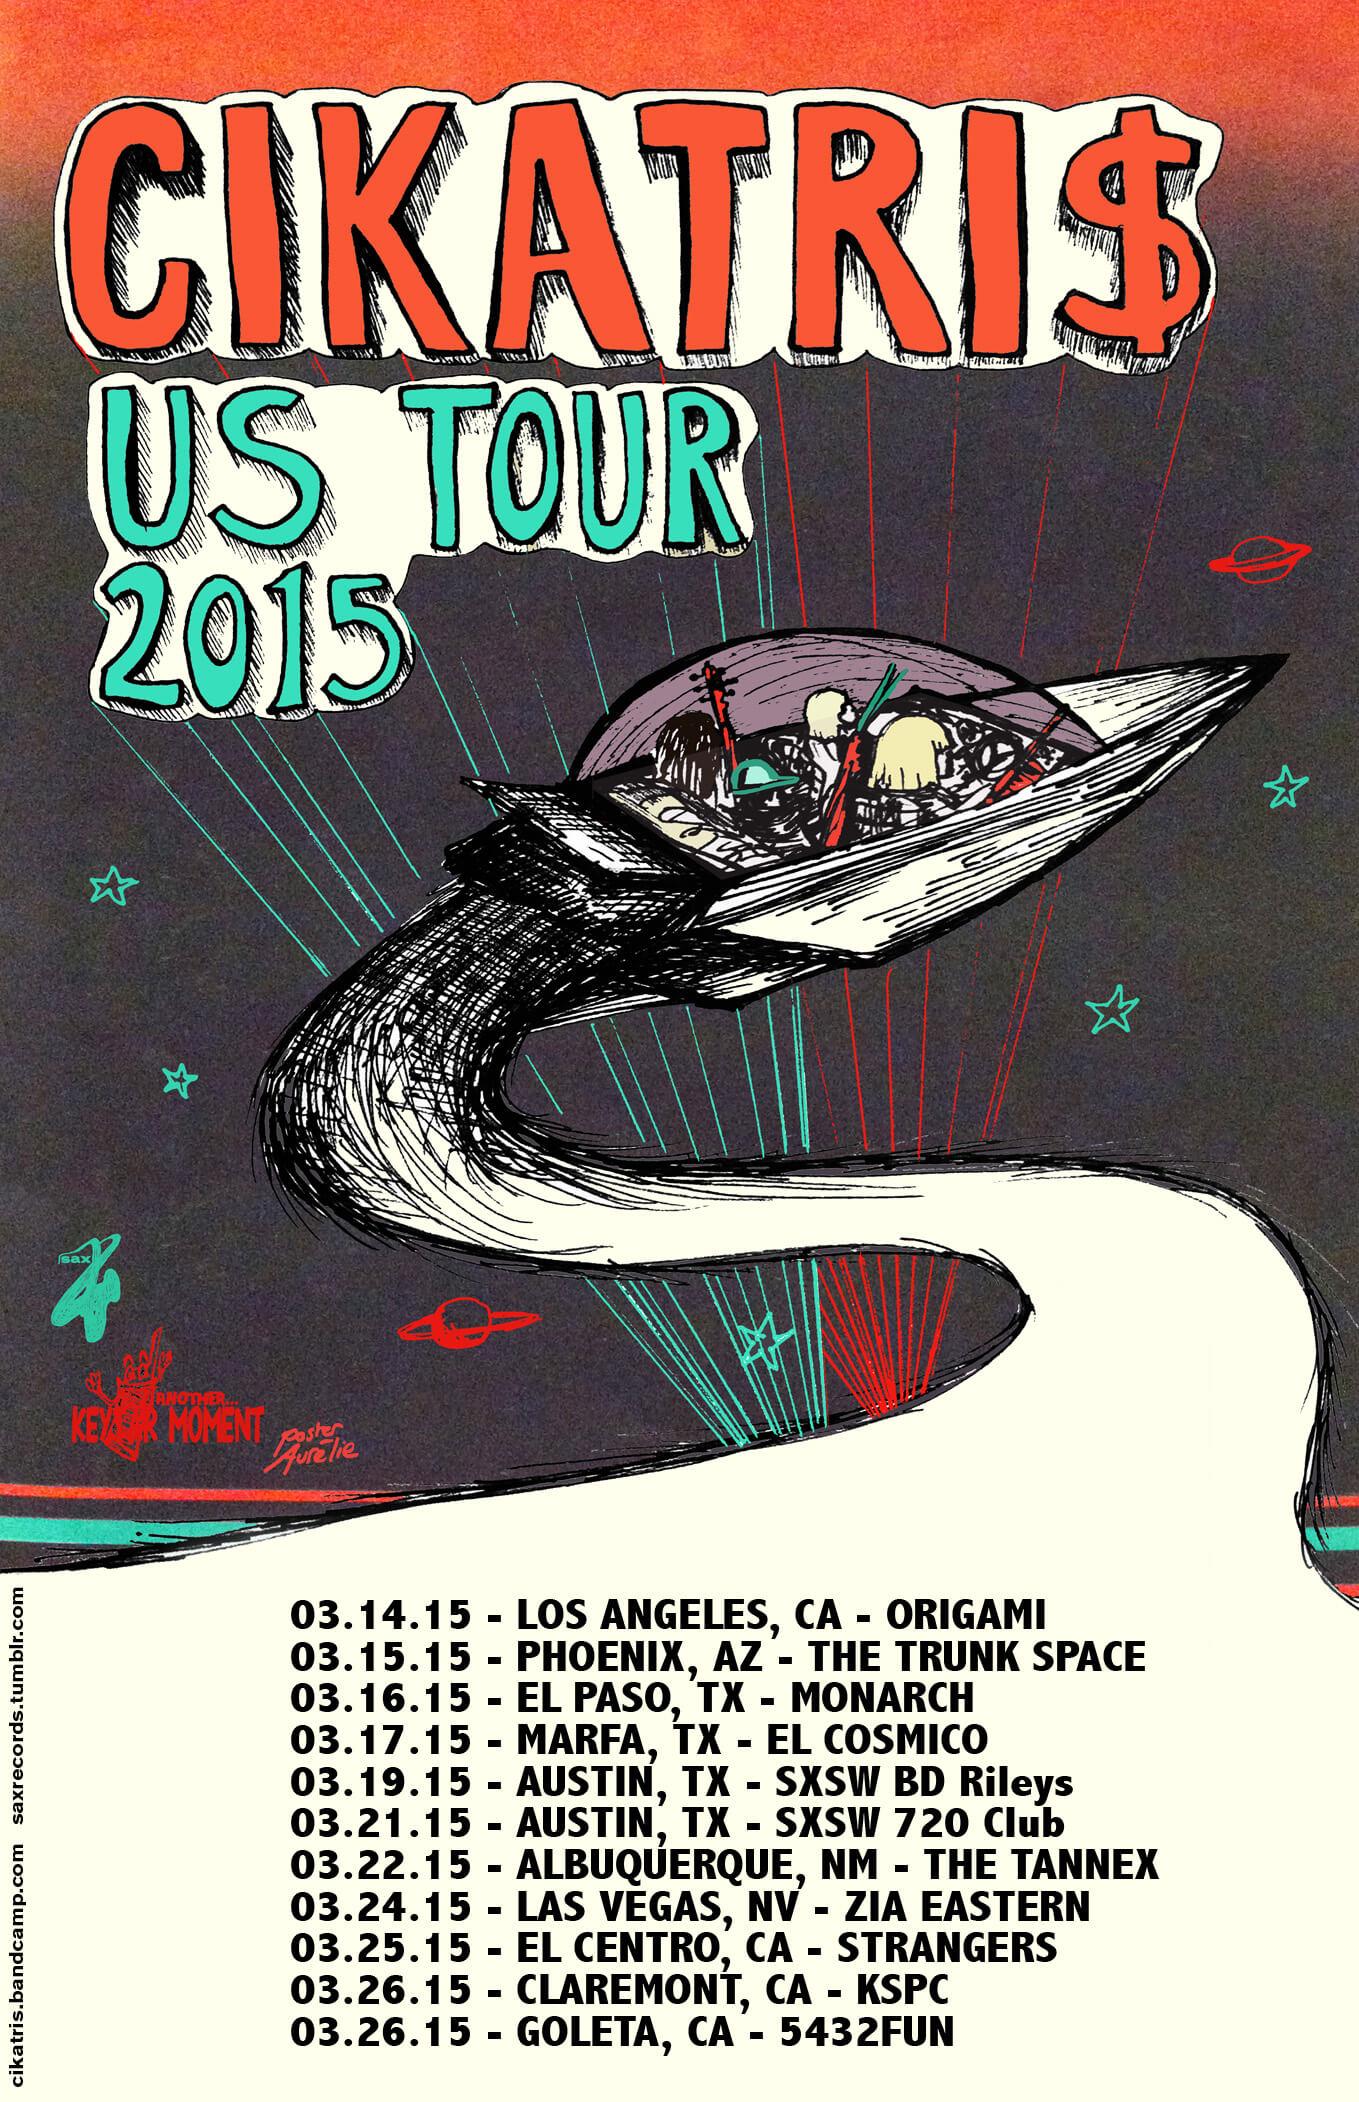 Poster CIKATRI$ US tour SXSW 2015